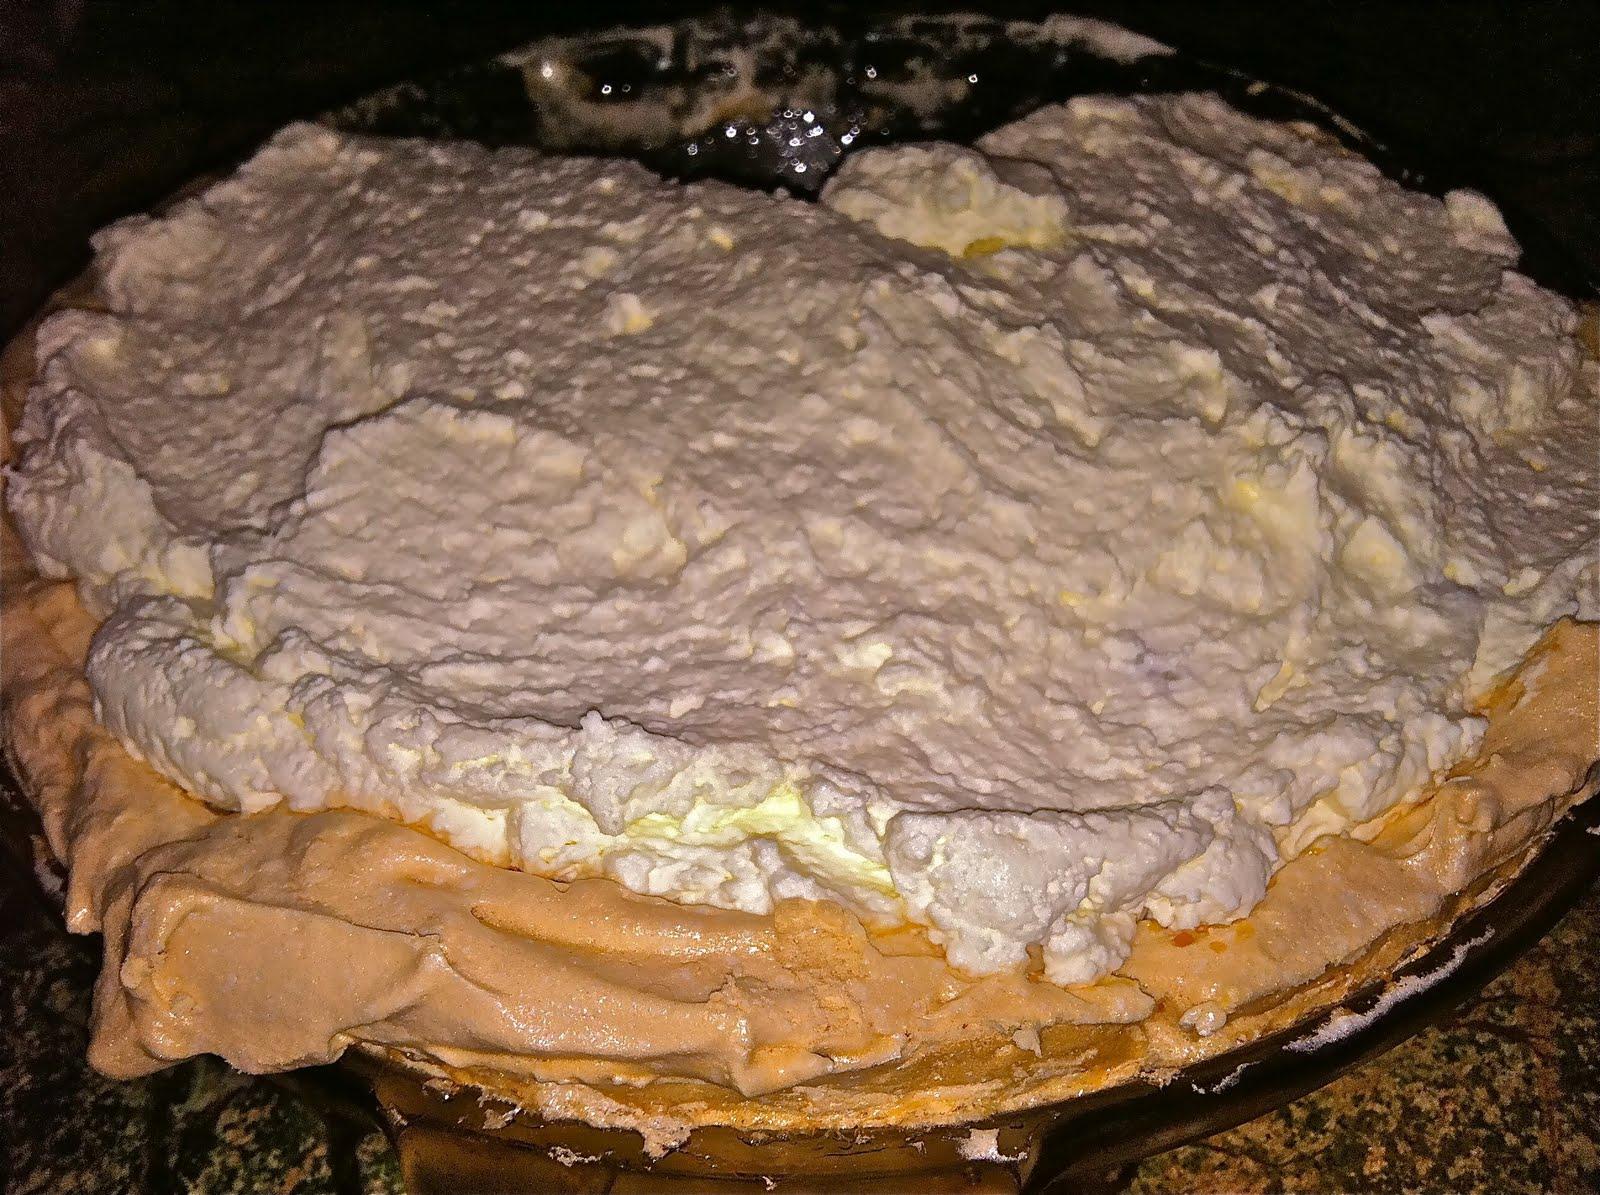 Things to Ponder: An Eastertime Heavenly Pie